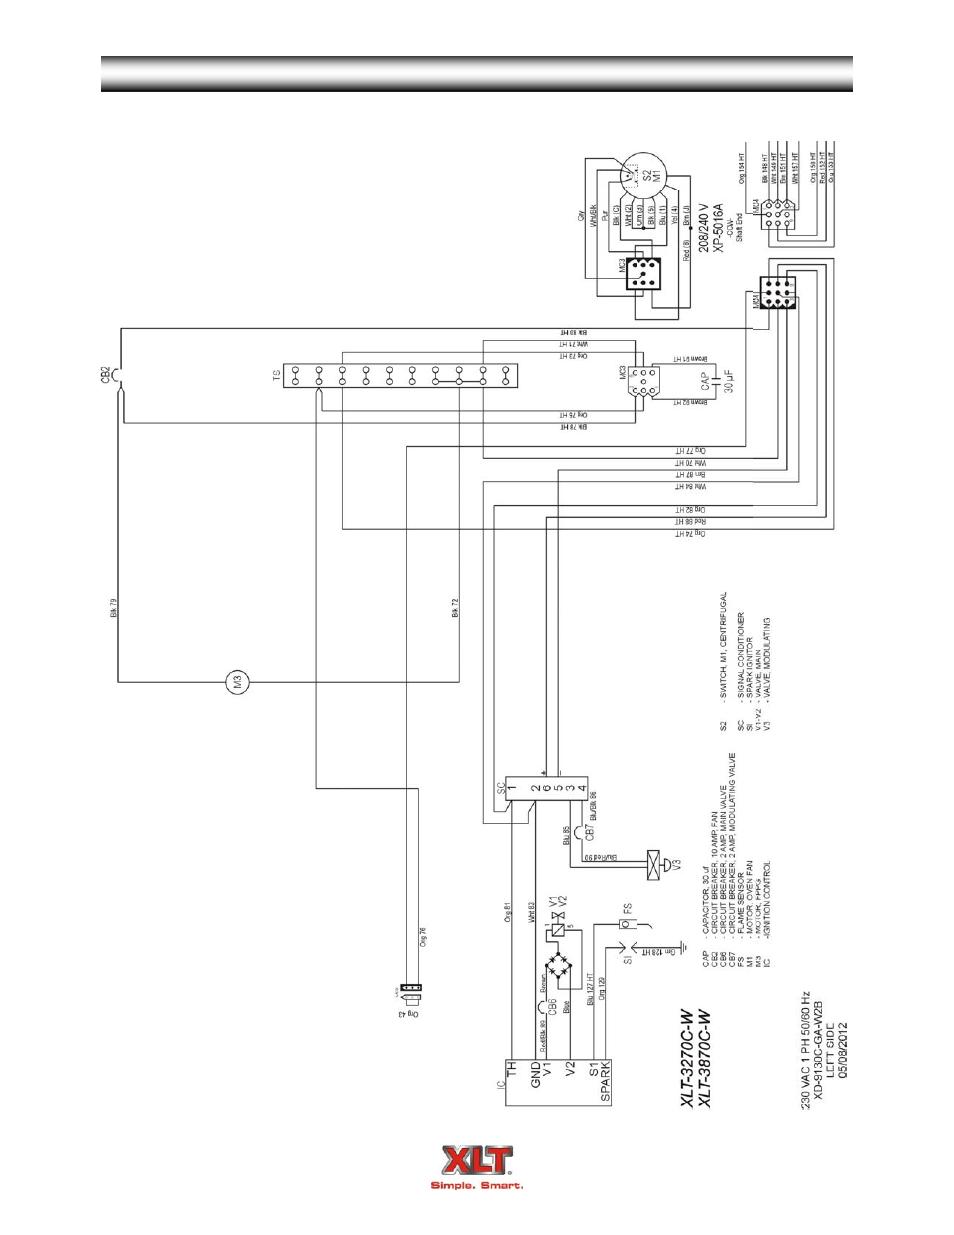 medium resolution of oven schematic world xlt xd 9006a gas oven version c